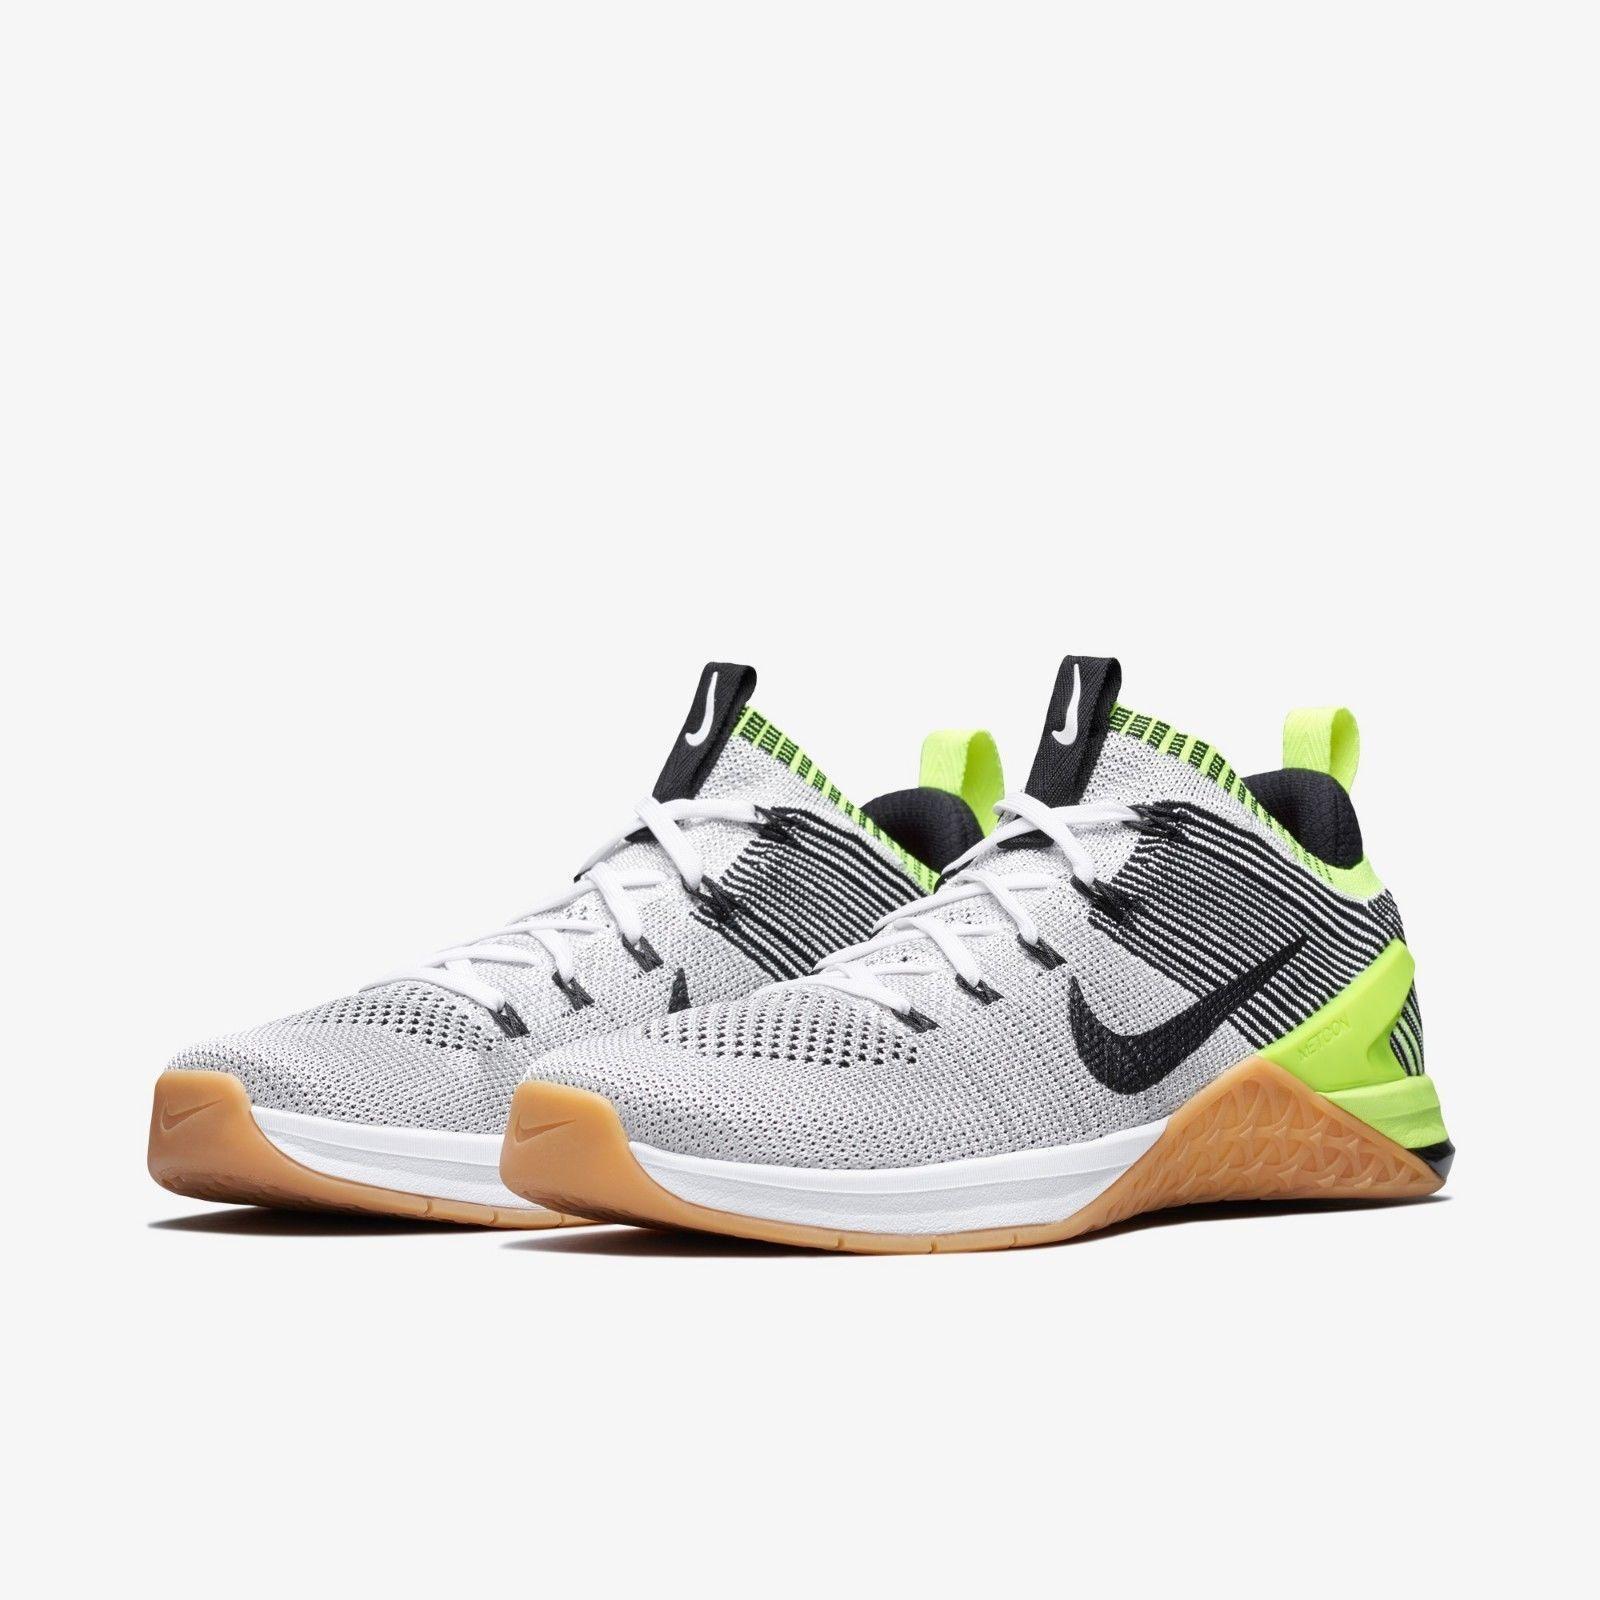 Nike Men's Metcon DSX Flyknit 2 Training Volt White Black Gum Training 2 sz 9 [924423-107] 0d992d